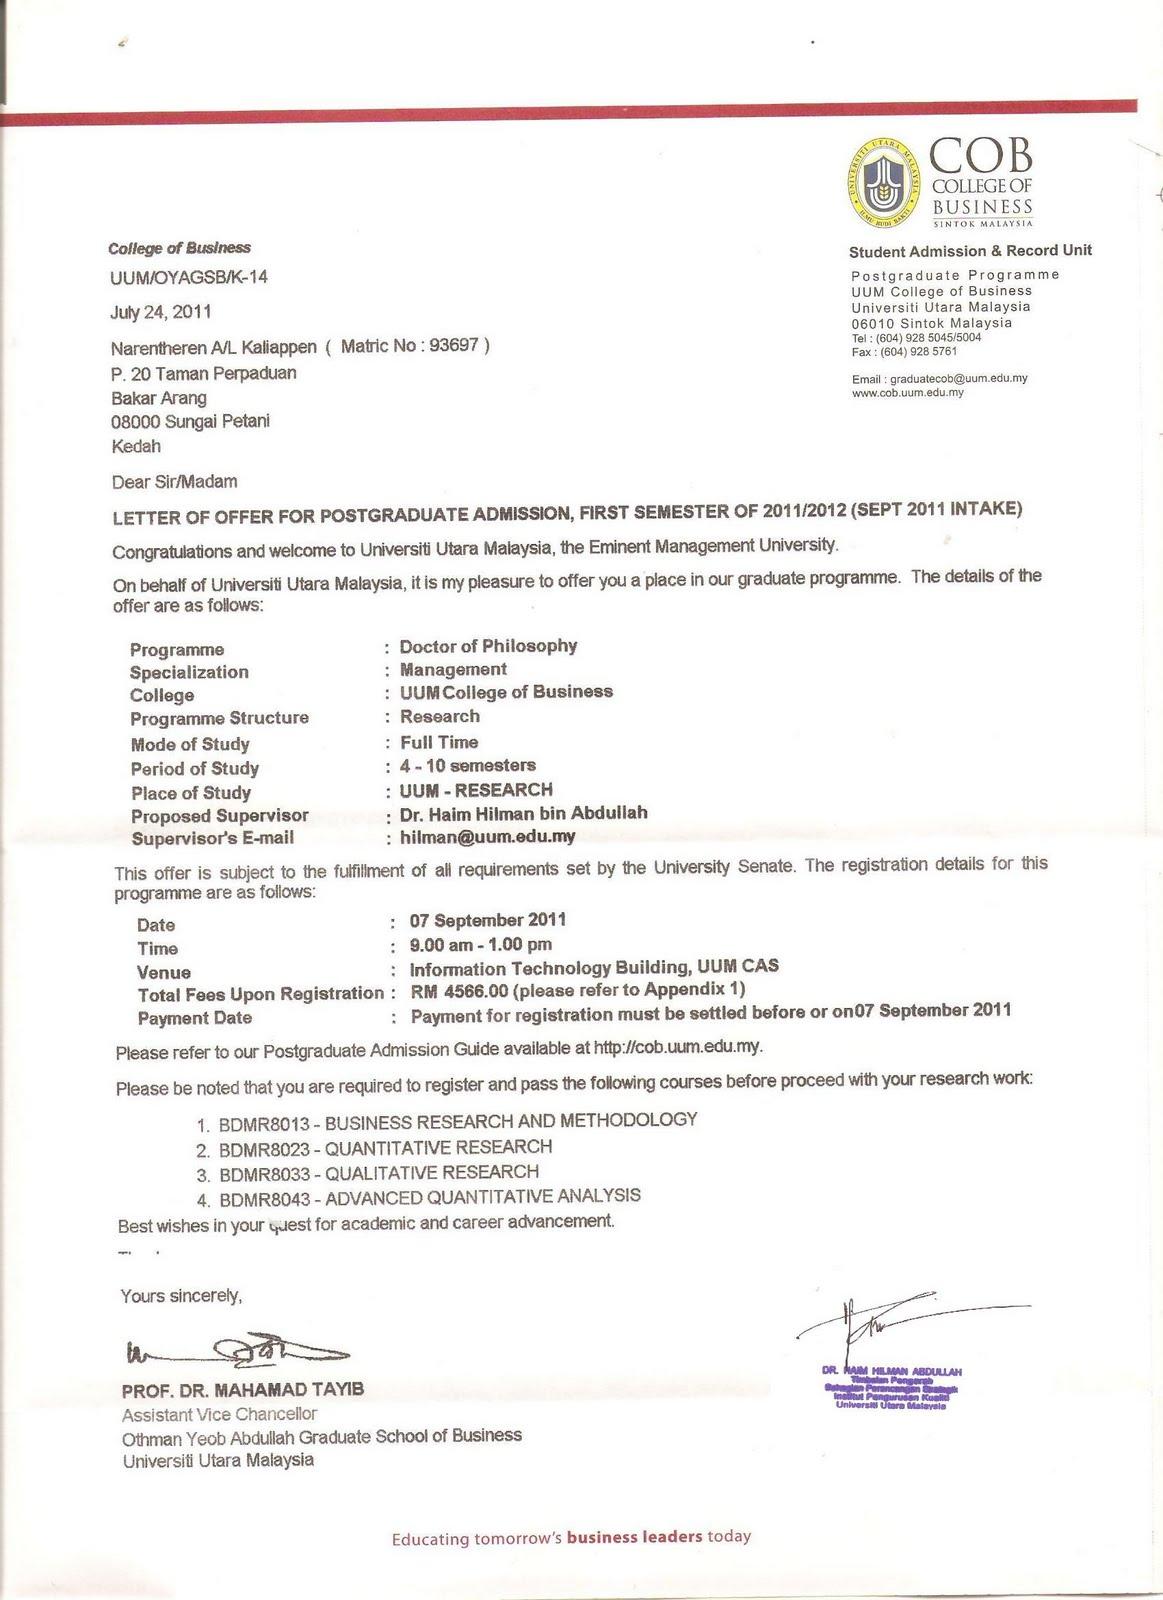 NaReNtHeReN My PhD Offer Letter